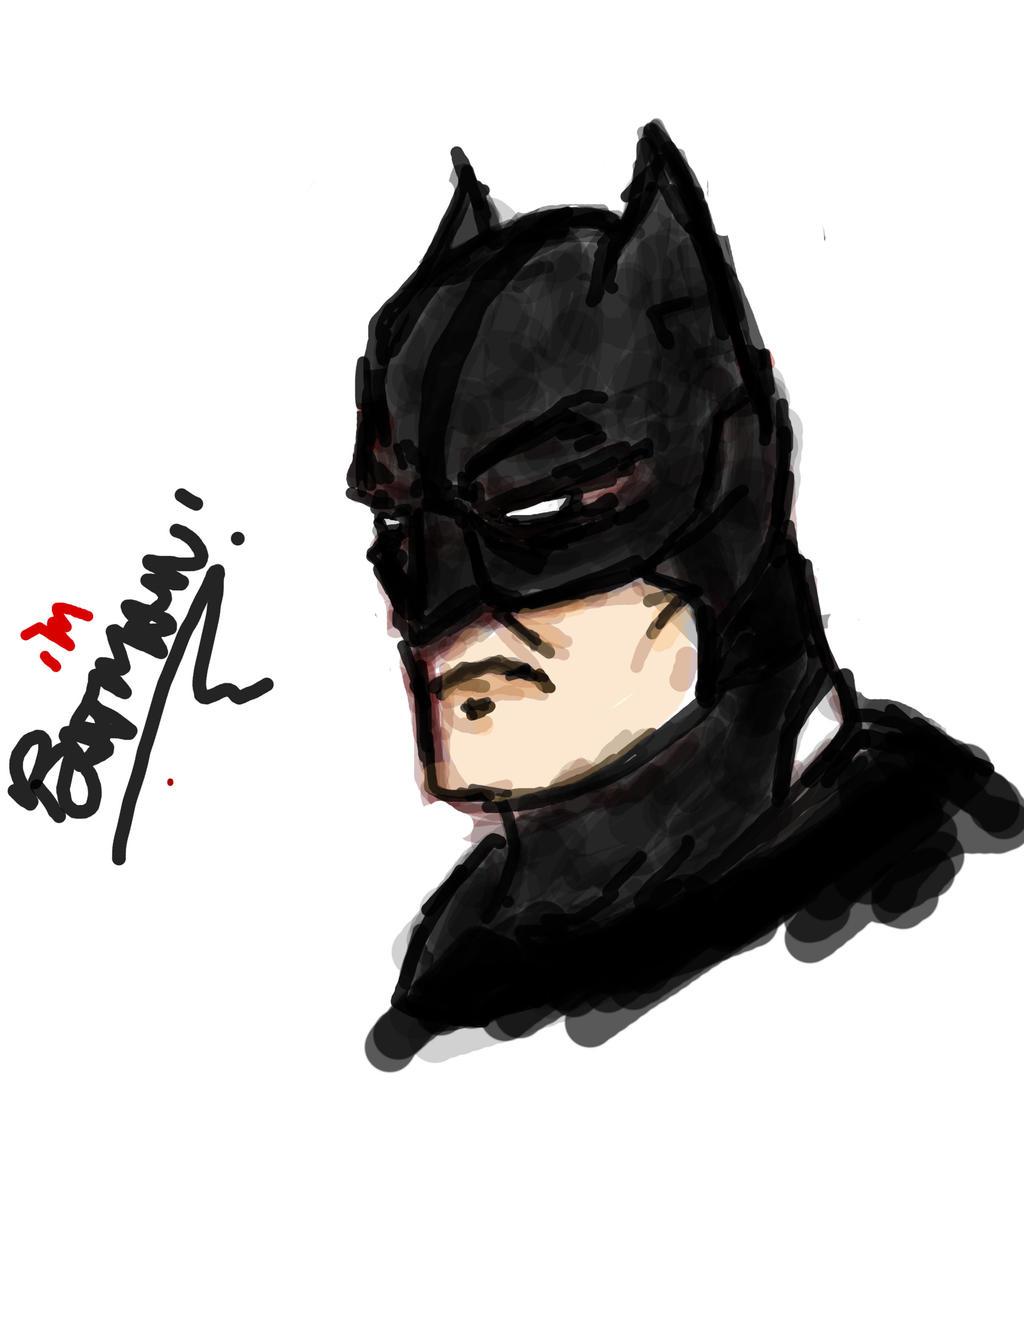 Graphics Tablet Sketch - I'm Batman by prathik